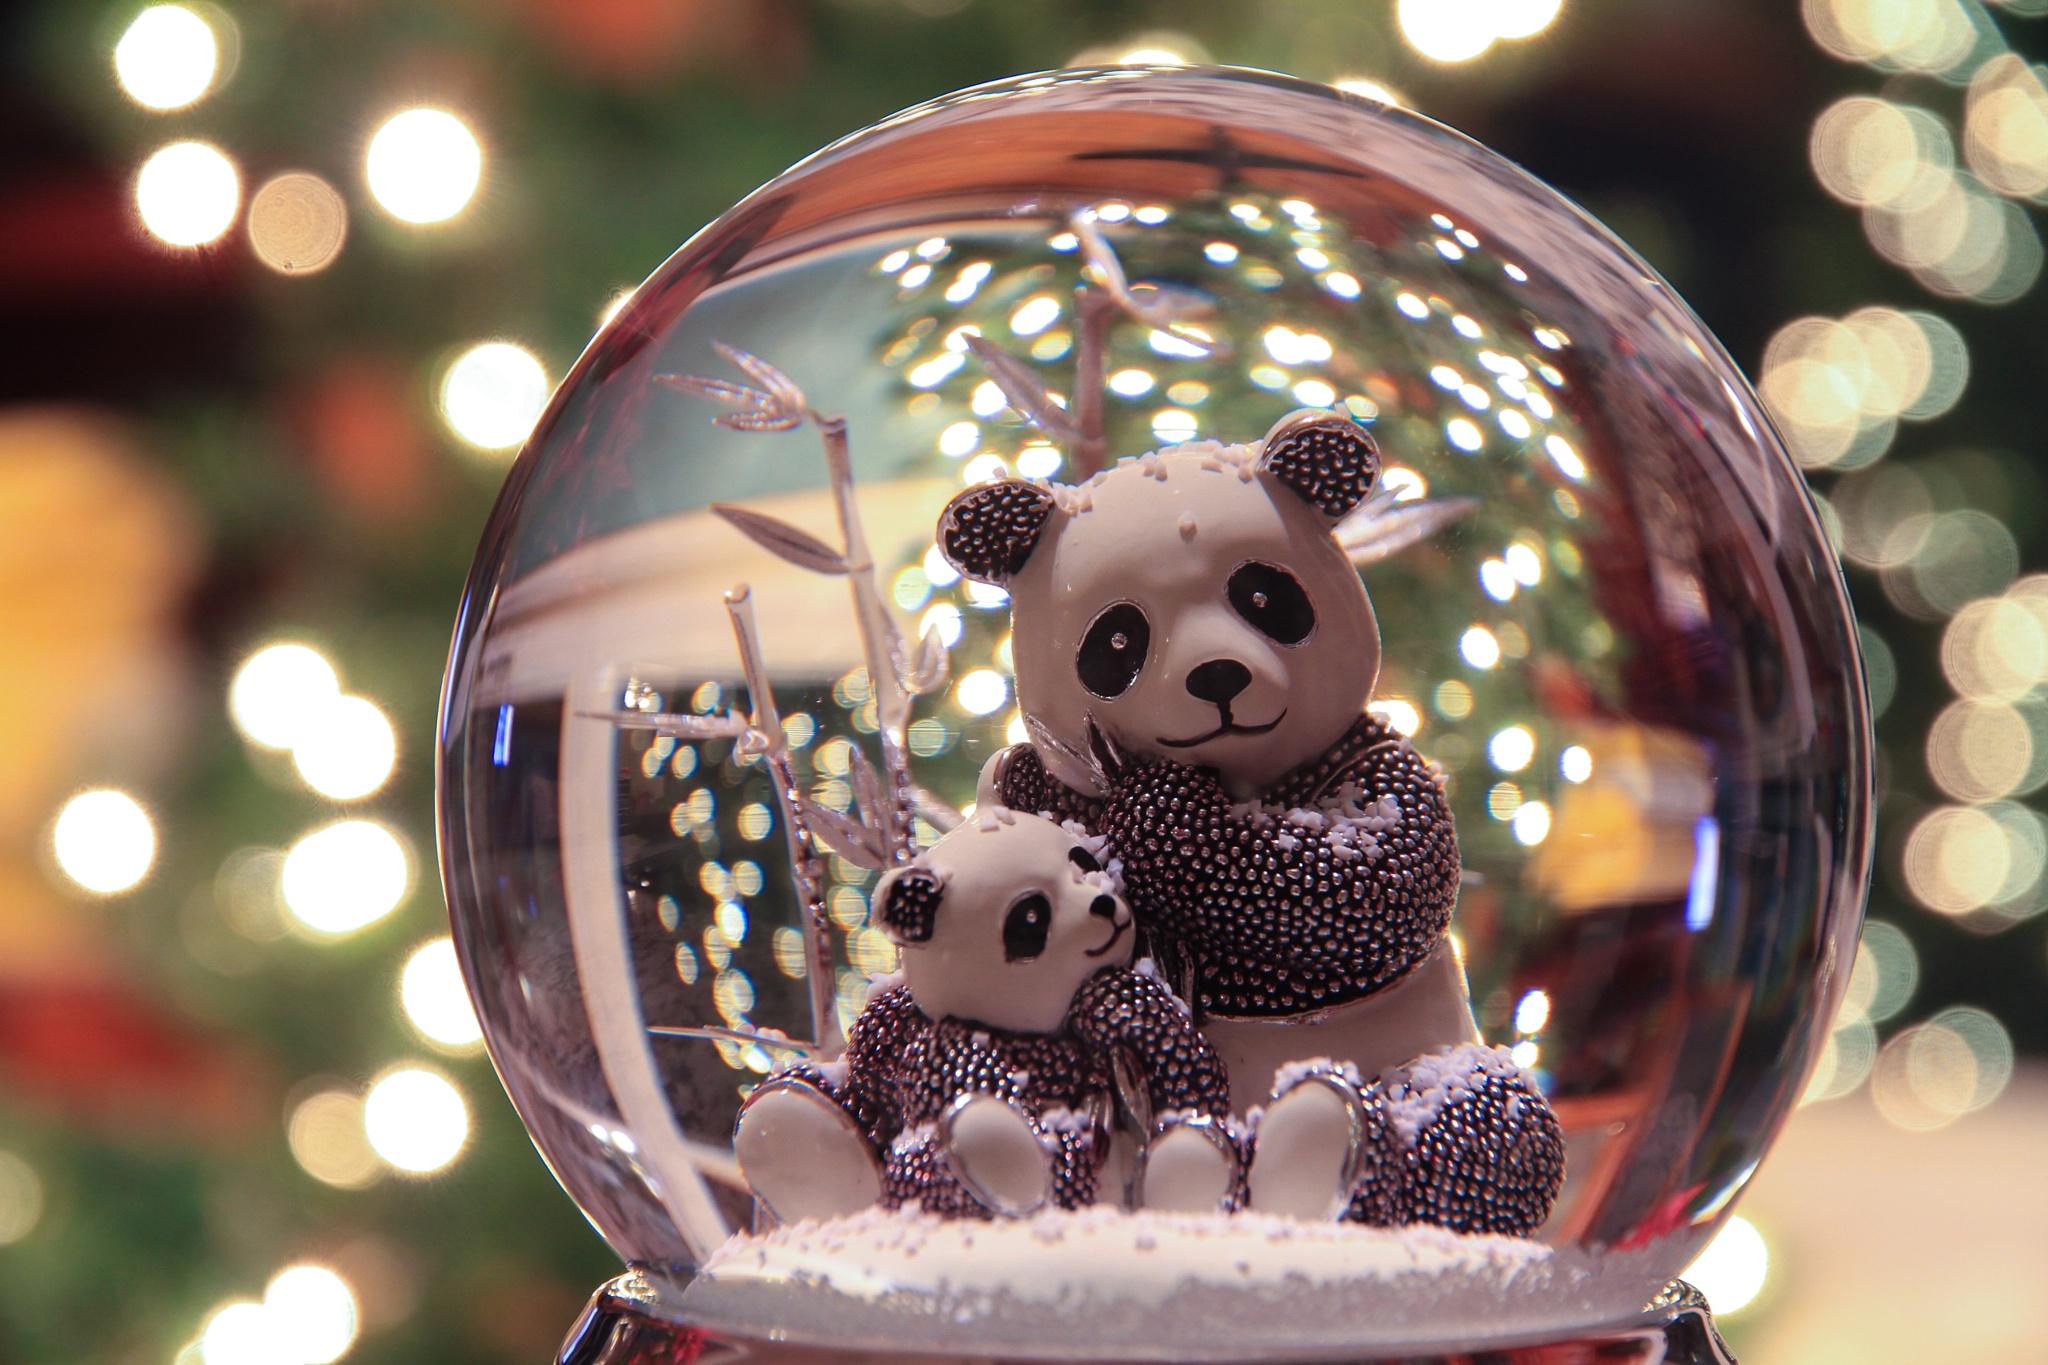 Bokeh Pandas by El Merrifield